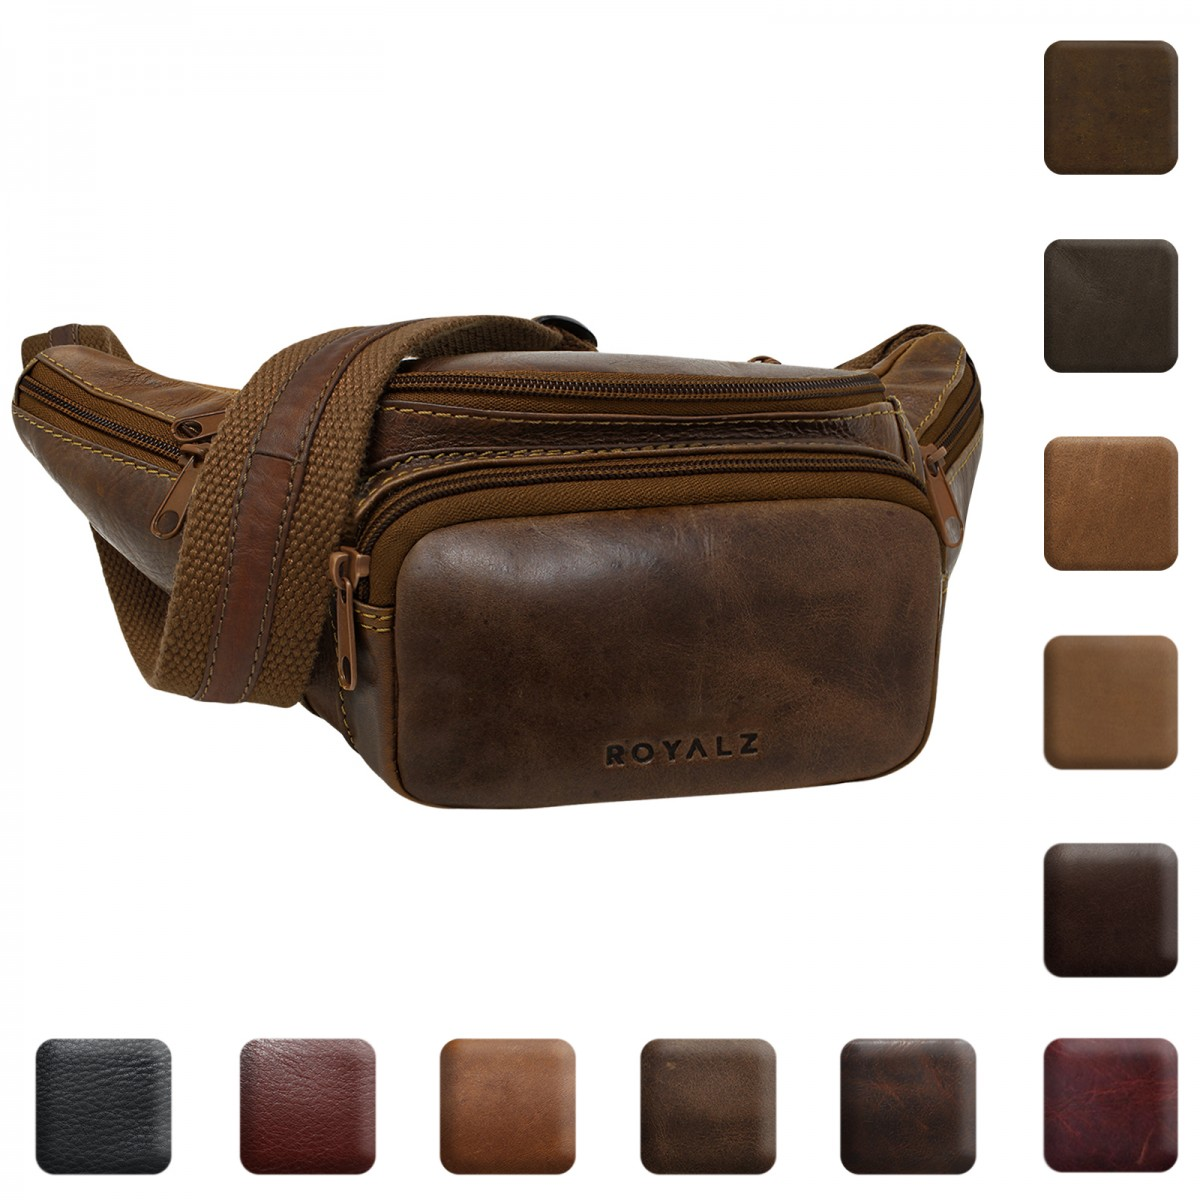 Details zu ROYALZ Gürtel Tasche Leder Bauch Hüft Reise Festival Bag Vintage